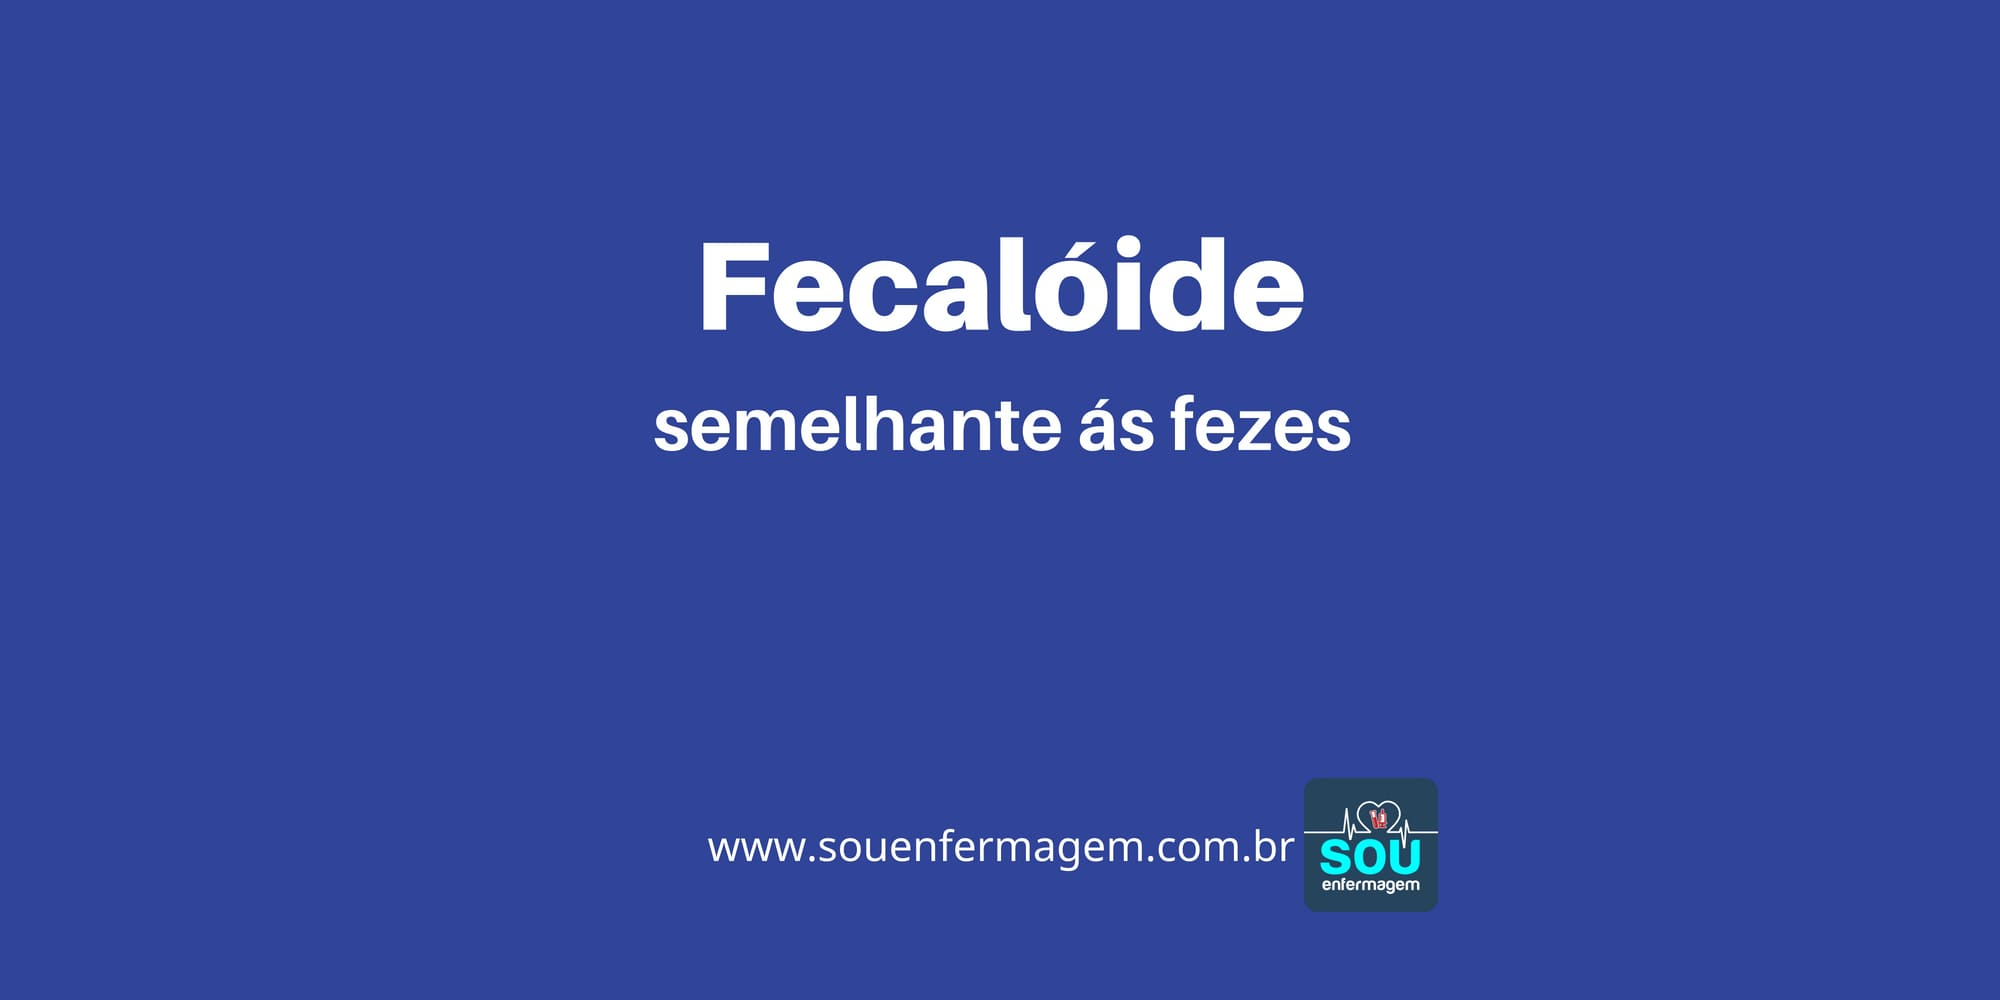 Fecalóide.jpg